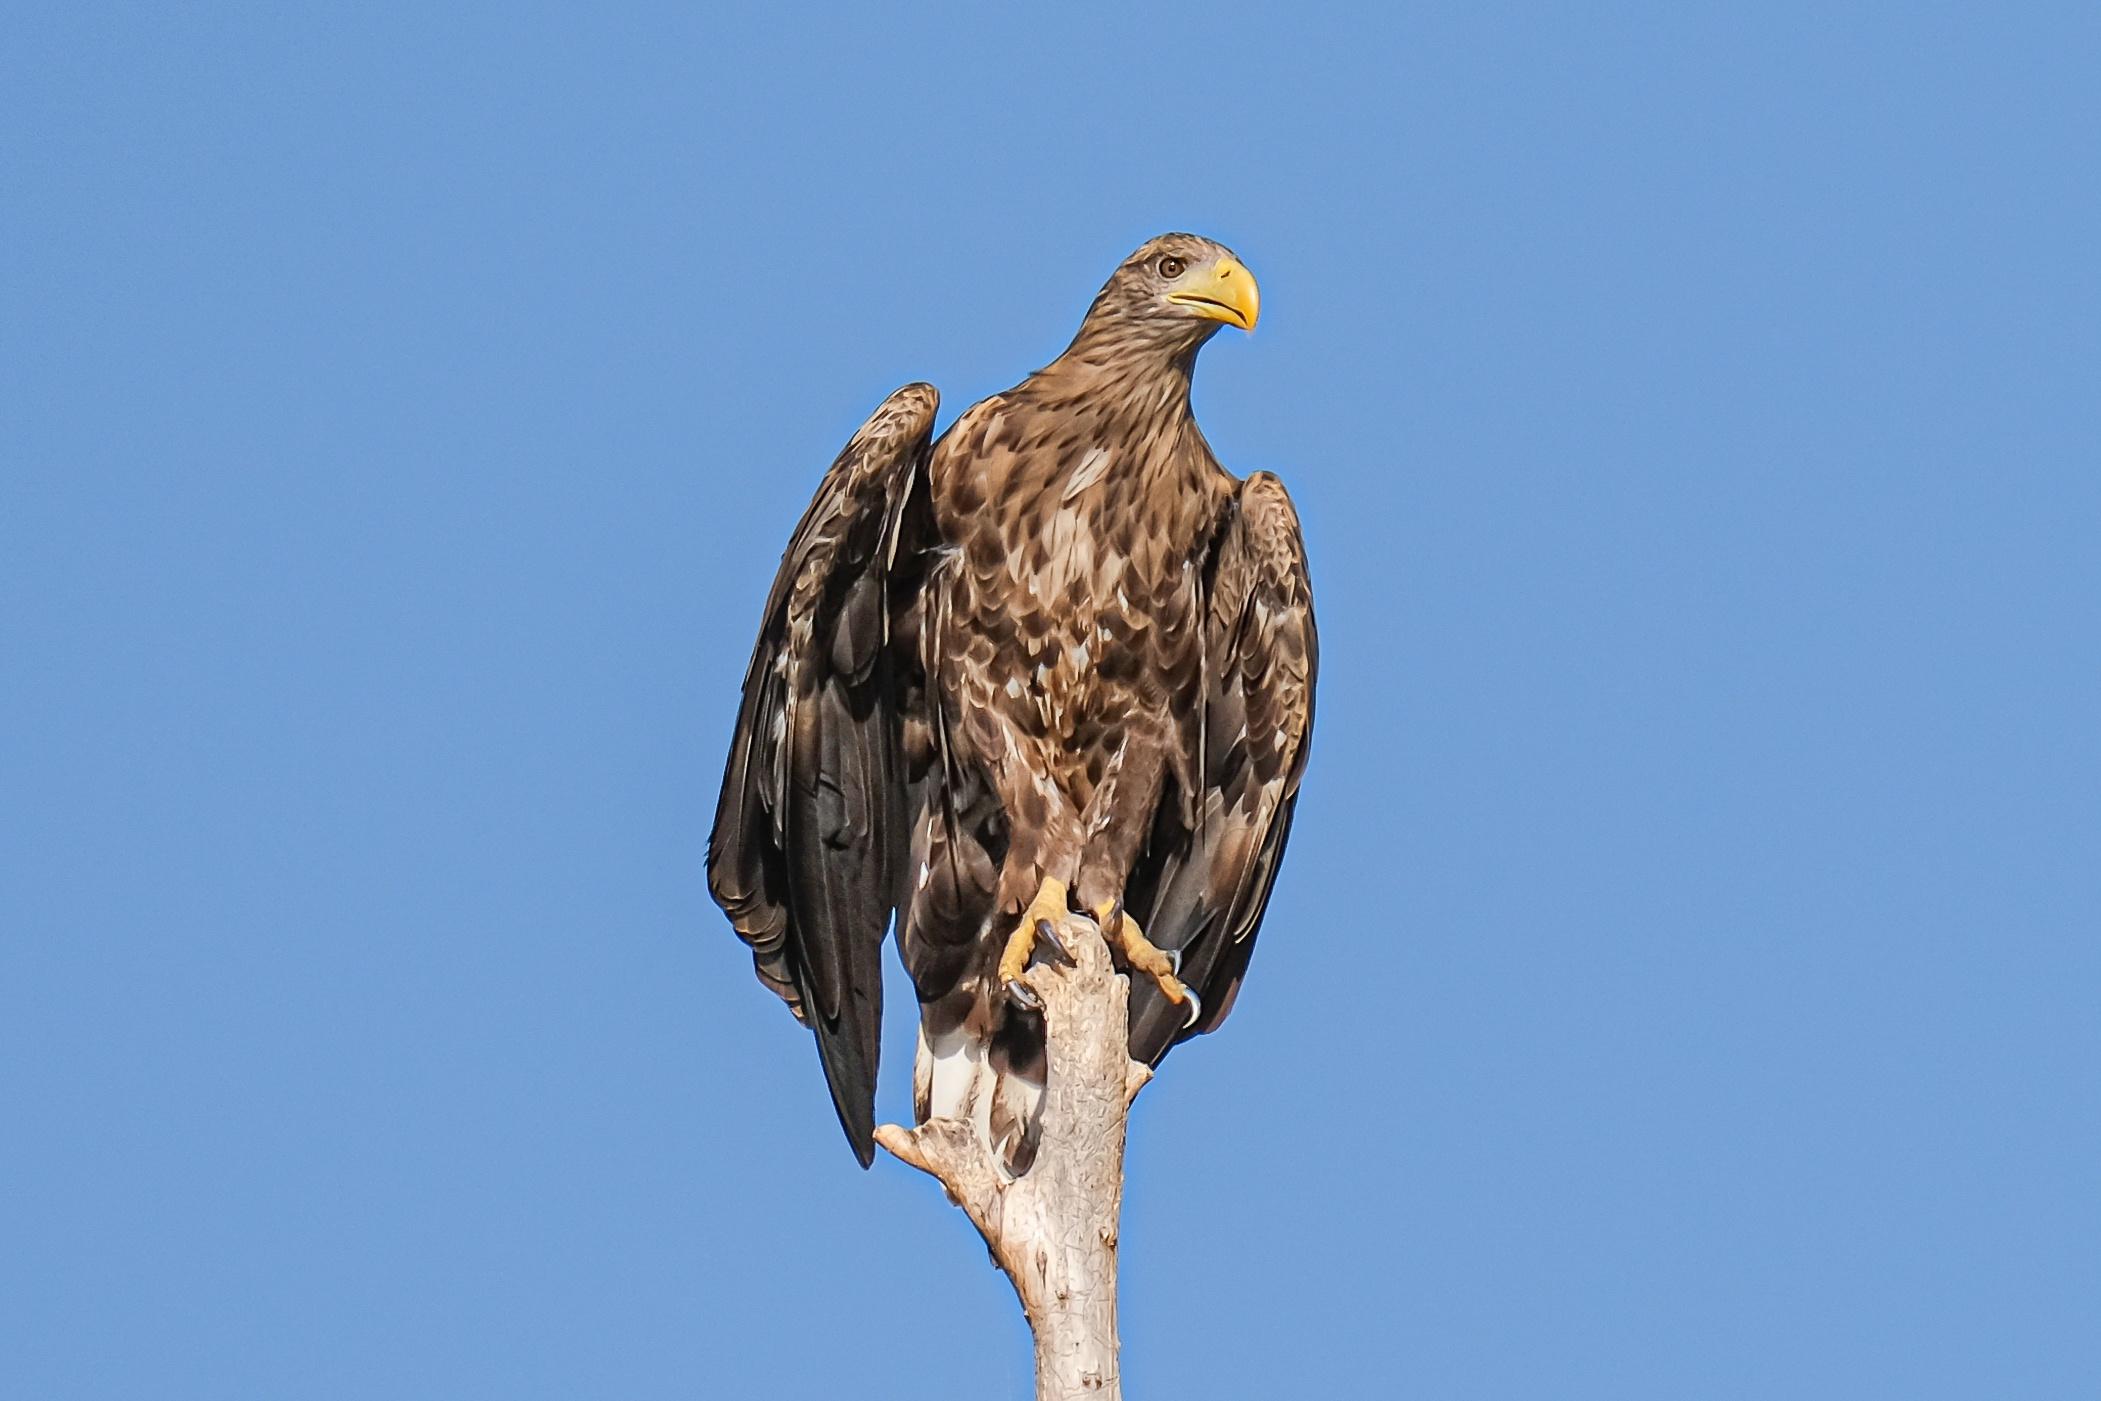 Bird Watching in Romania, Danube Delta Experience